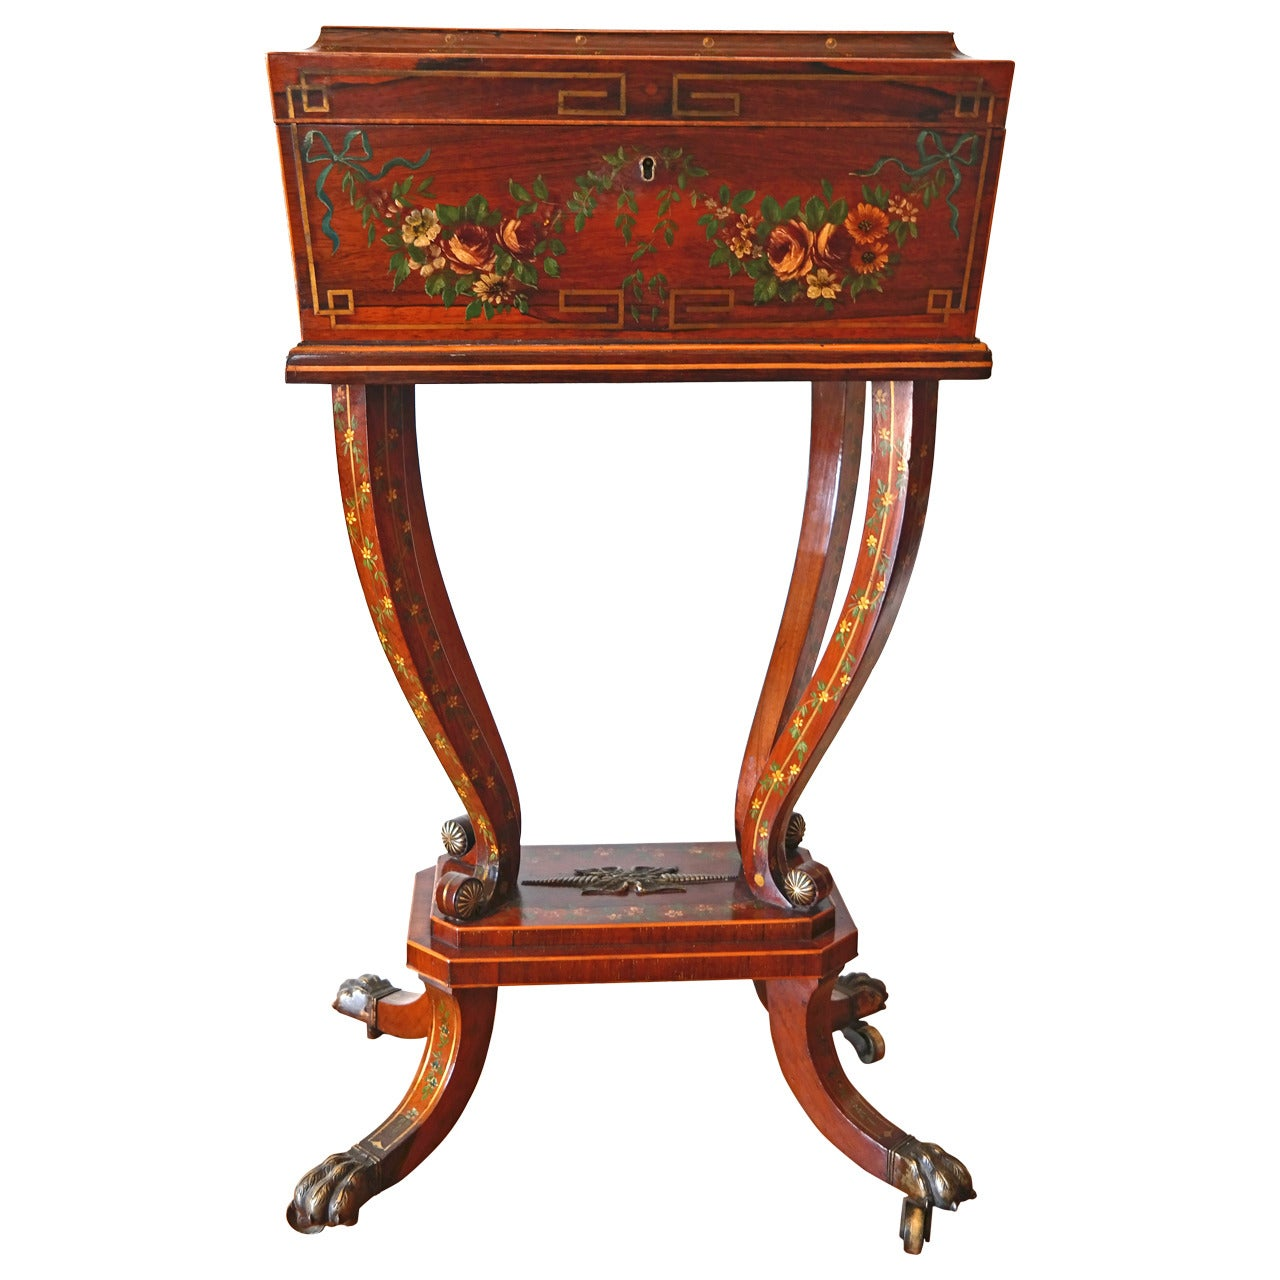 19th Century Regency Rosewood Workbox